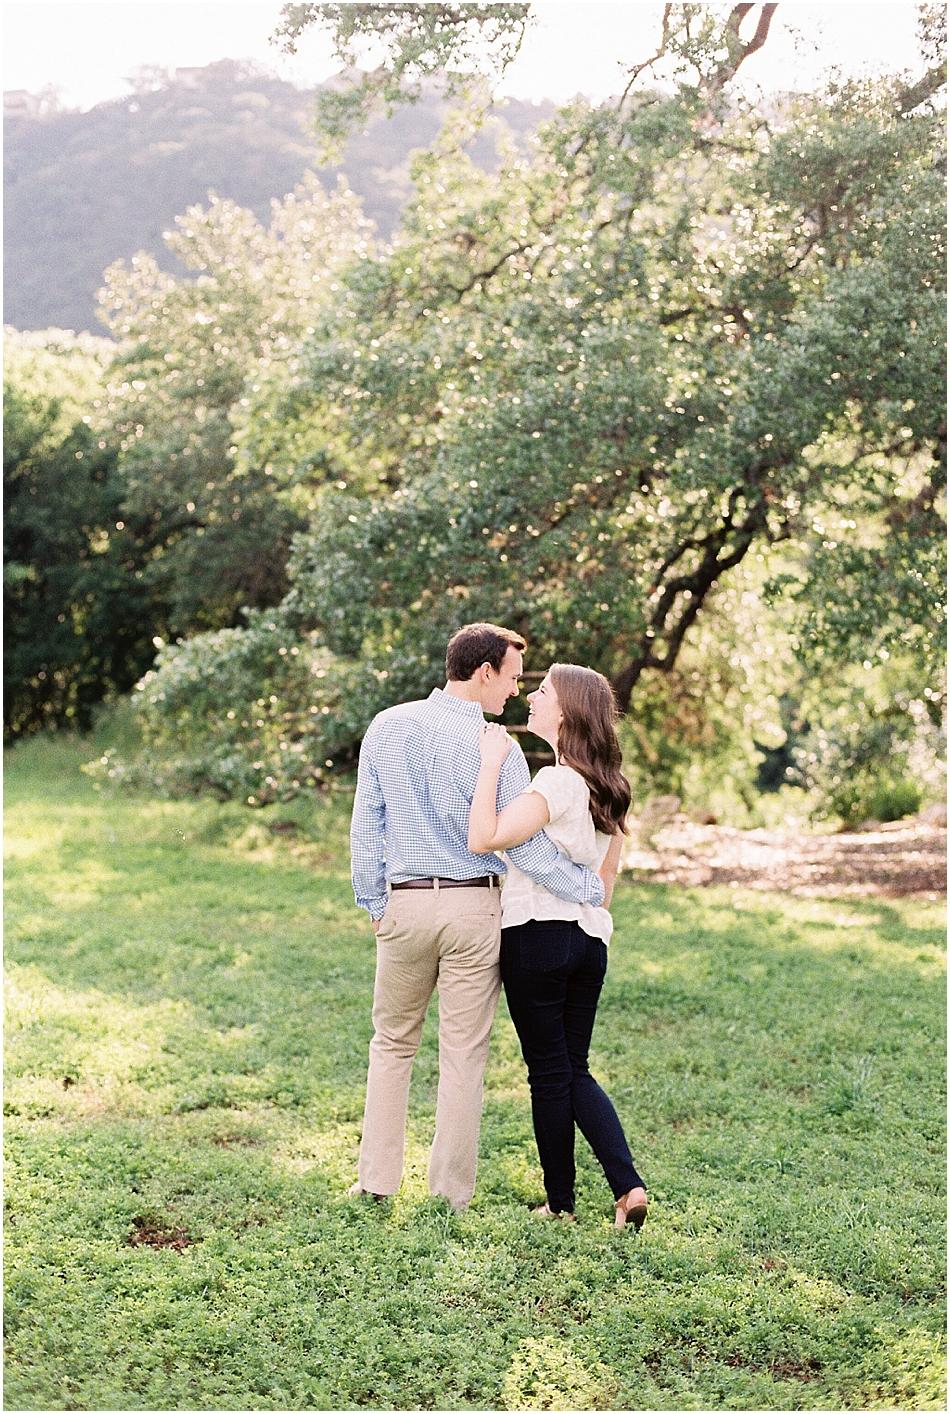 Laura + Nick | Engagement | Fine Art Film | Austin Texas | Emilie Anne Photography-11.jpg